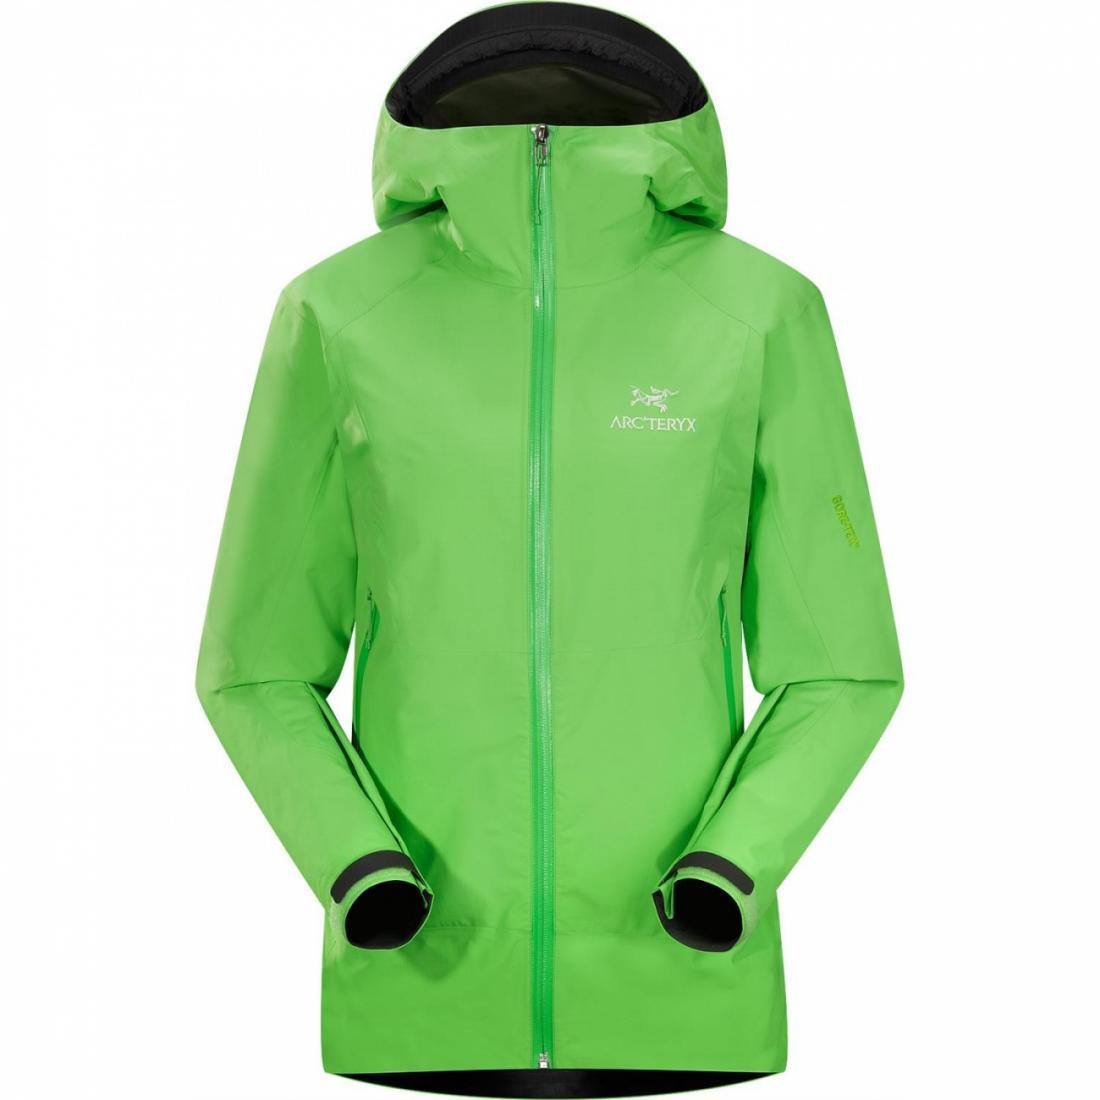 Куртка Beta SL жен.. Производитель: Arcteryx, артикул: 102614